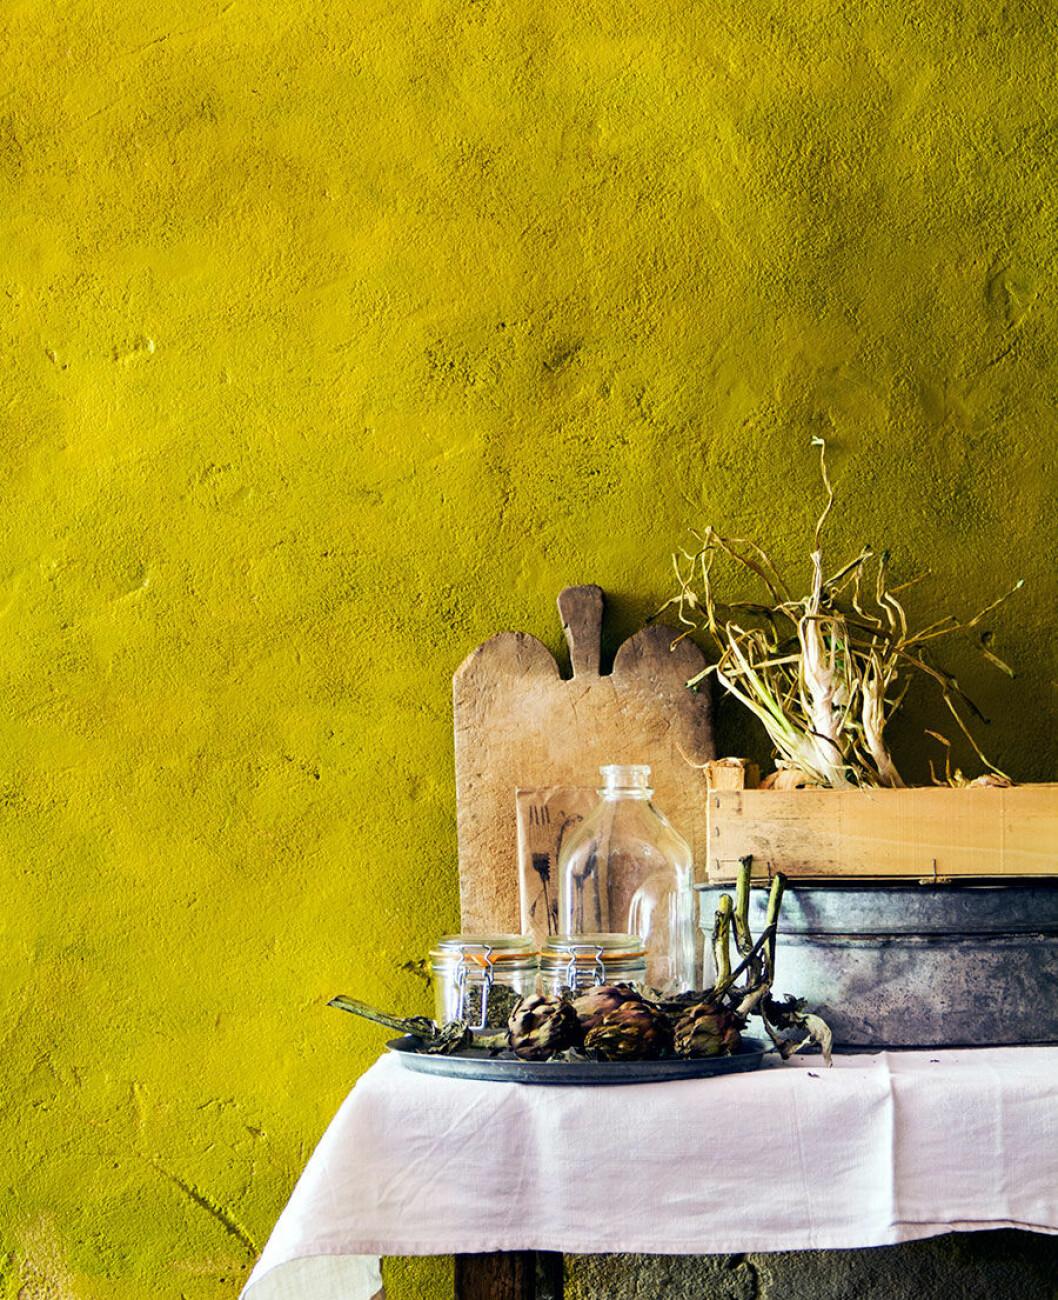 hans_blomquist_yellow_wall